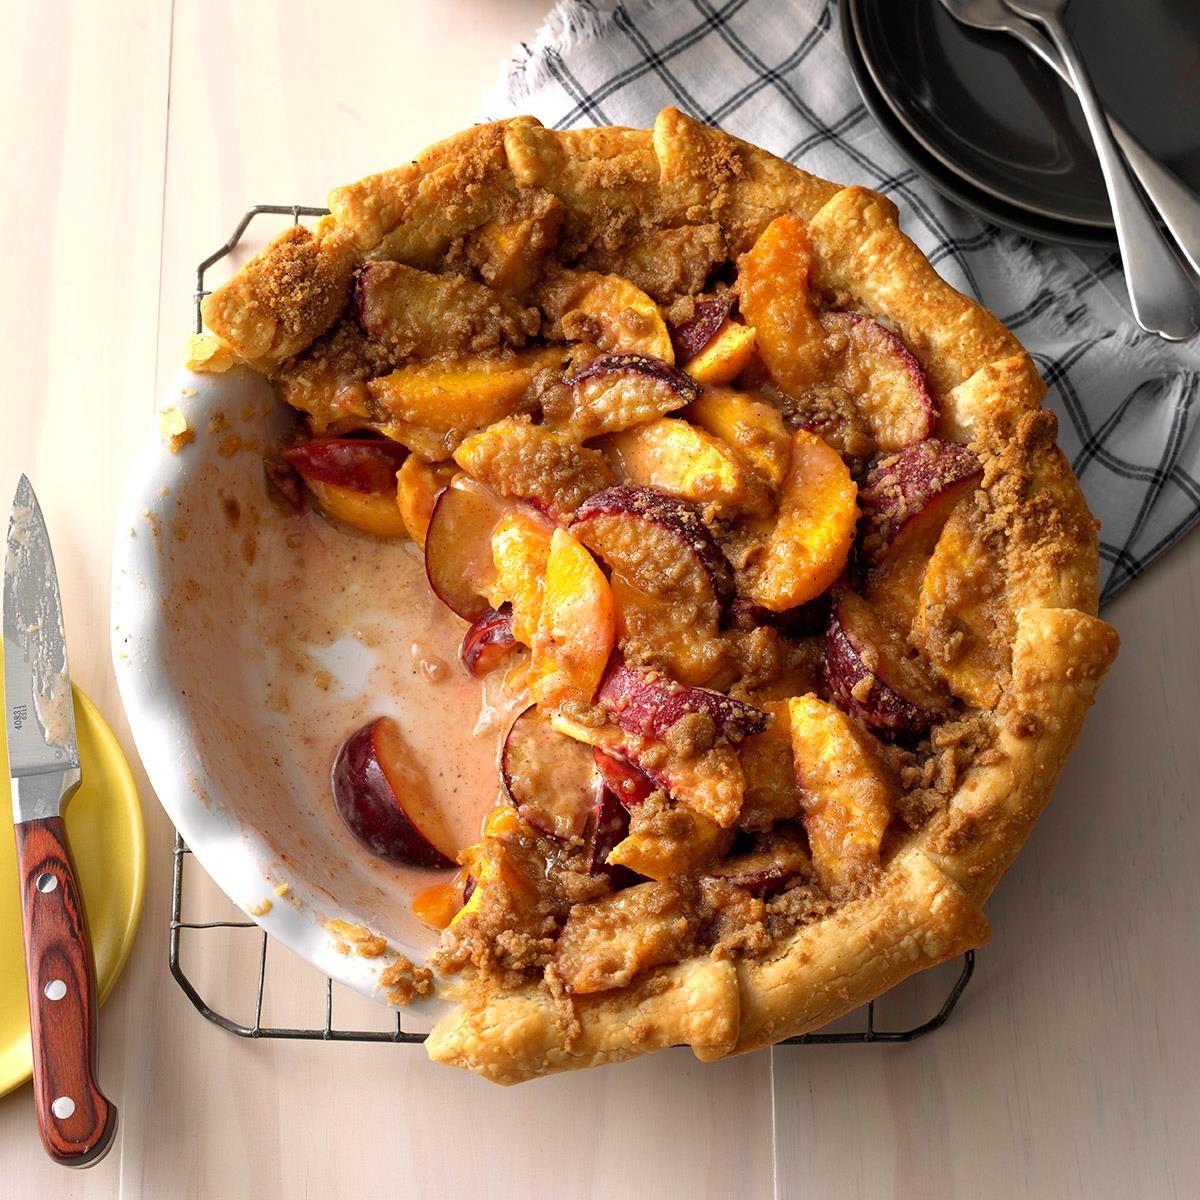 33 of Our Best Peach Dessert Recipes